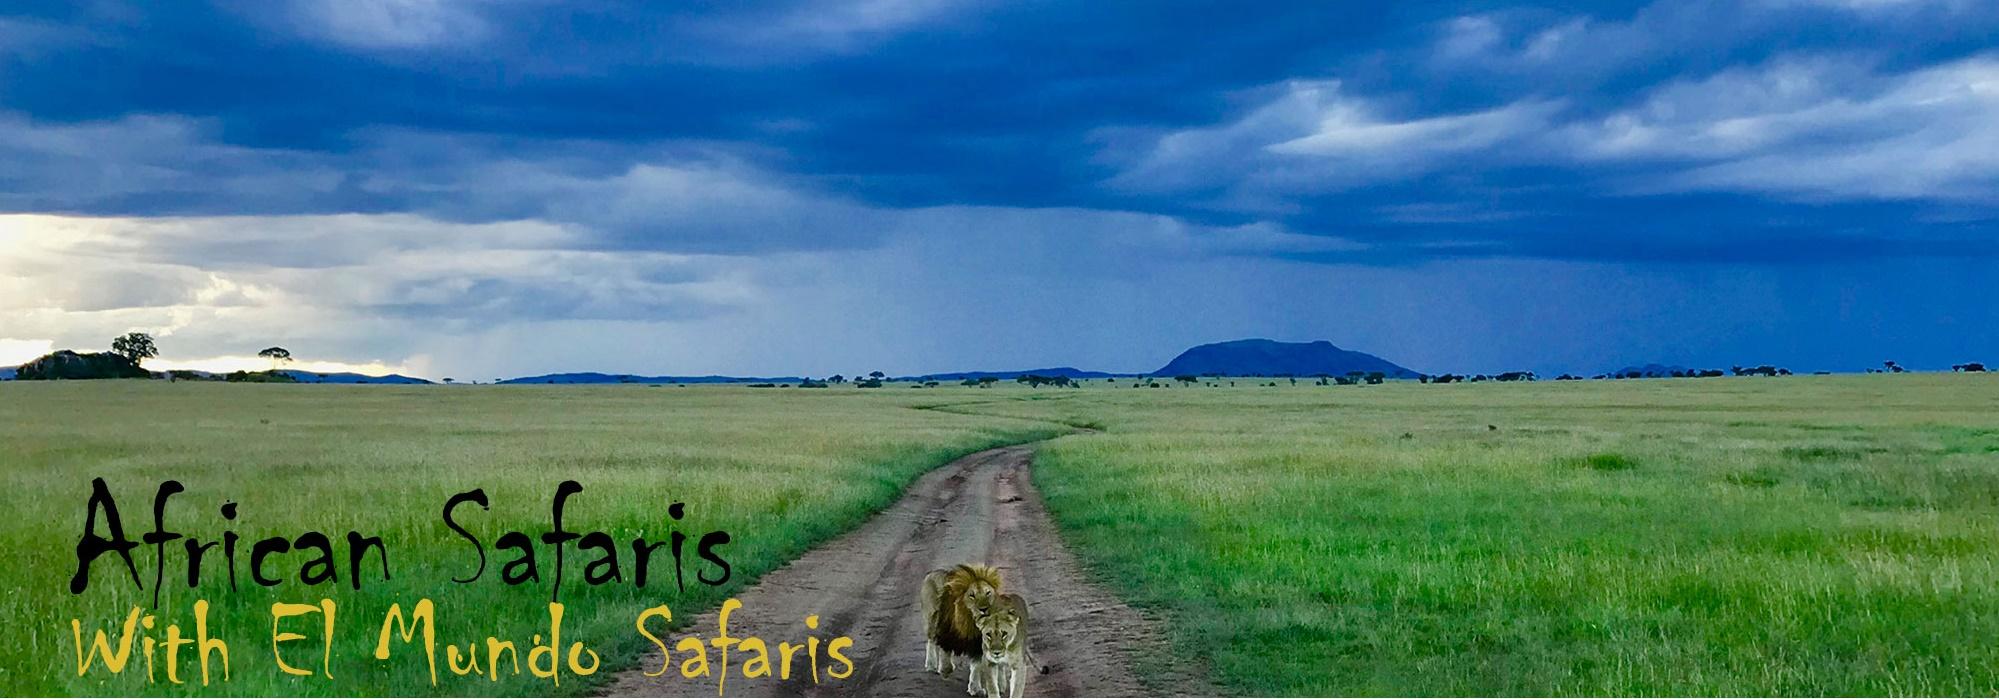 ElmundoSafaris_AfricanSafaris_img